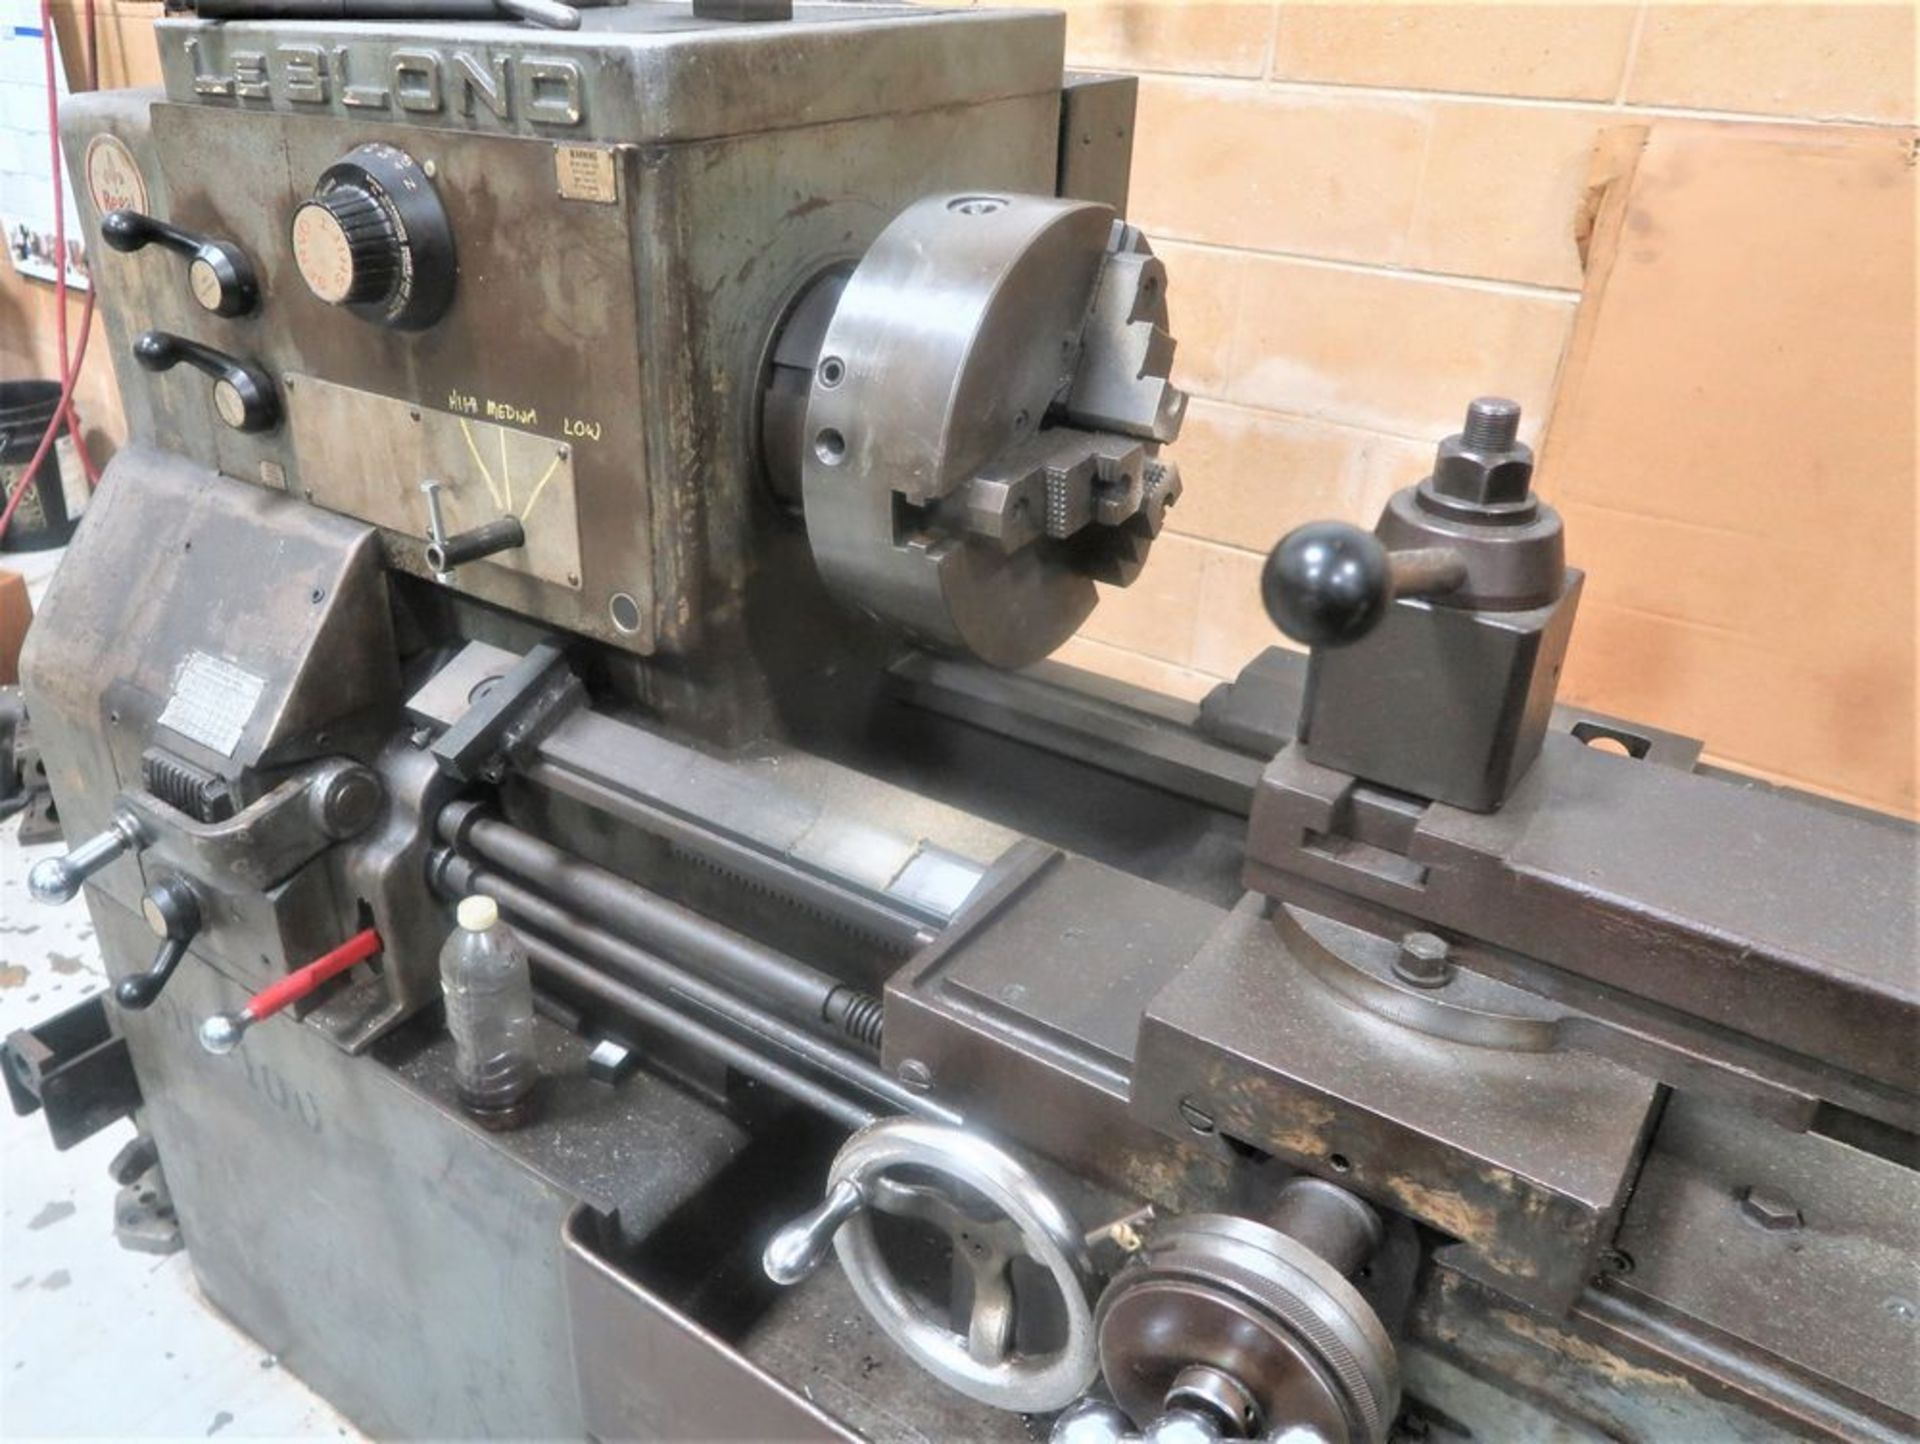 "19"" X 54"" LeBlond Regal Tool room Engine Lathe, S/N 5E179 - Image 3 of 5"